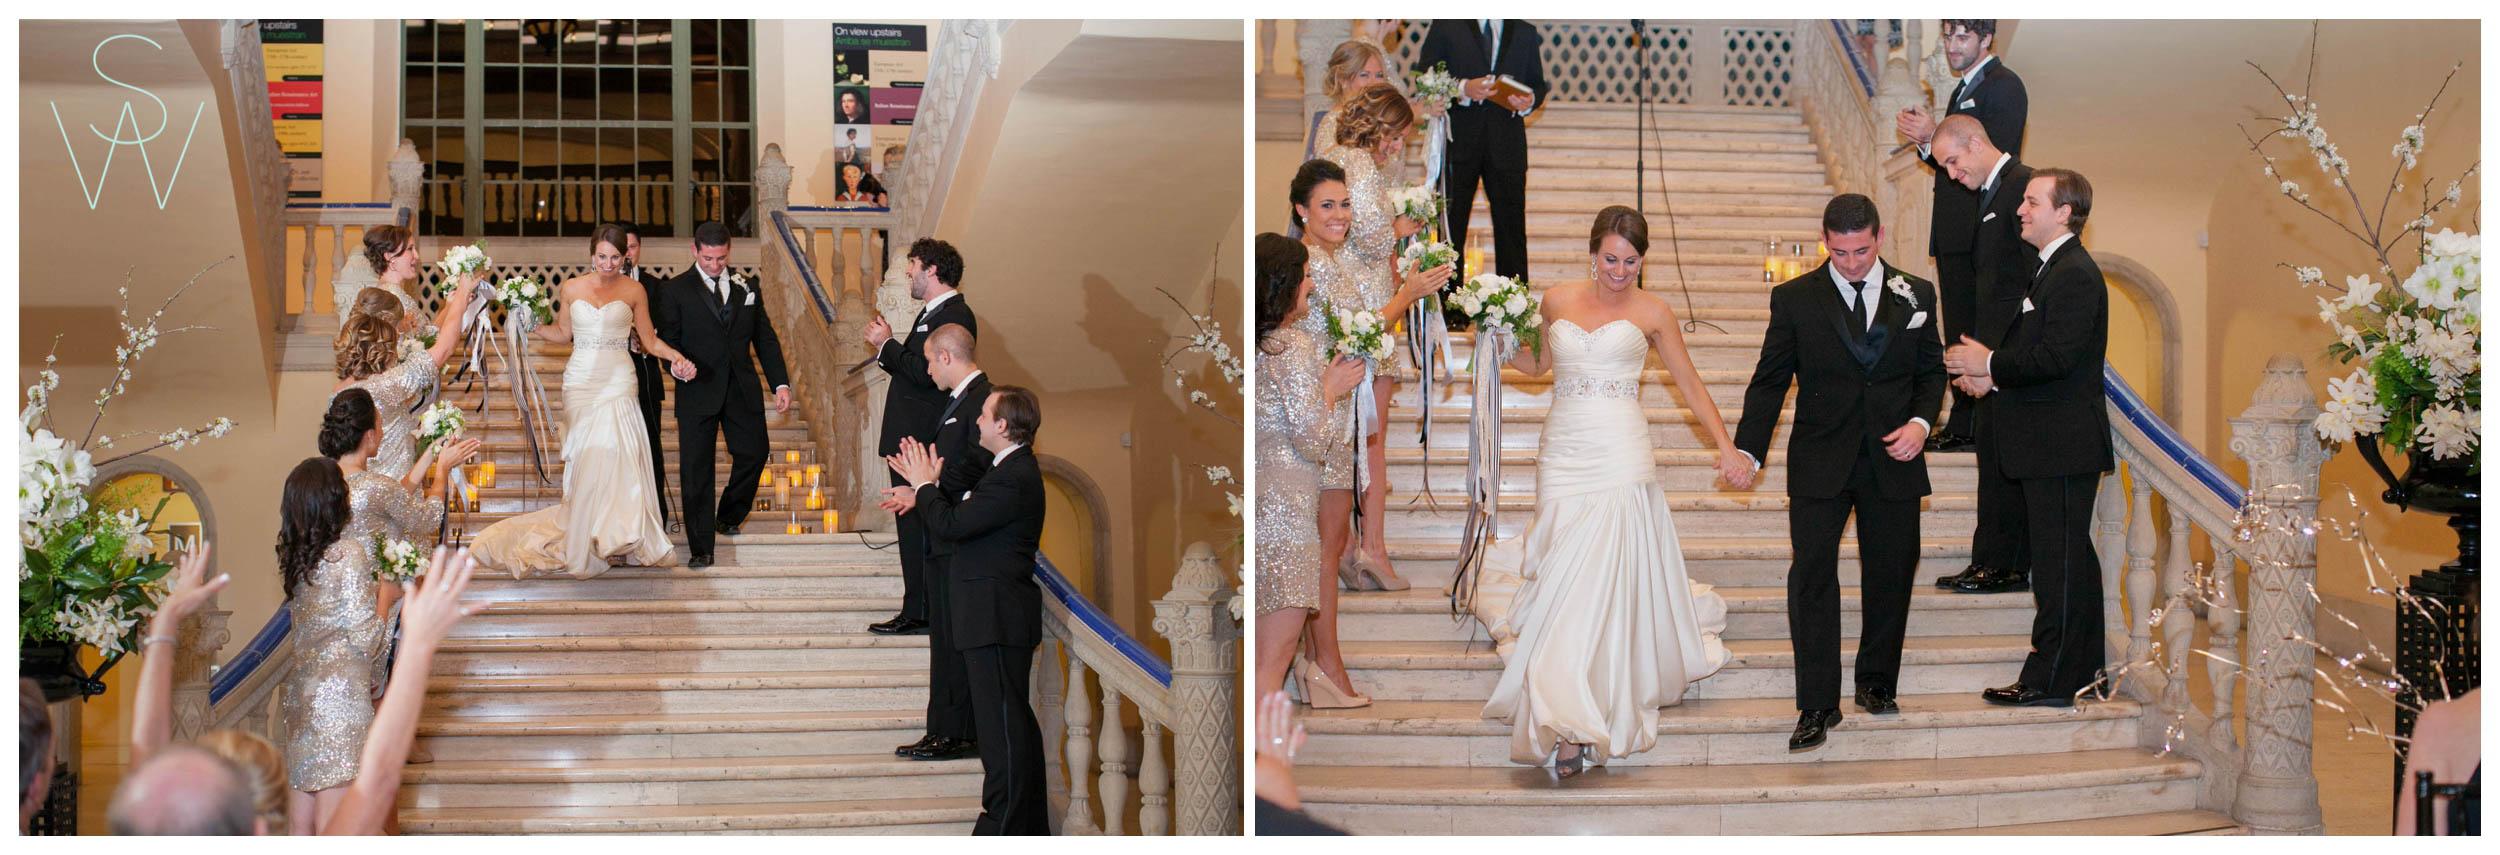 Shewanders.sdma_.wedding.photography-1057.jpg.wedding.photography-1057.jpg